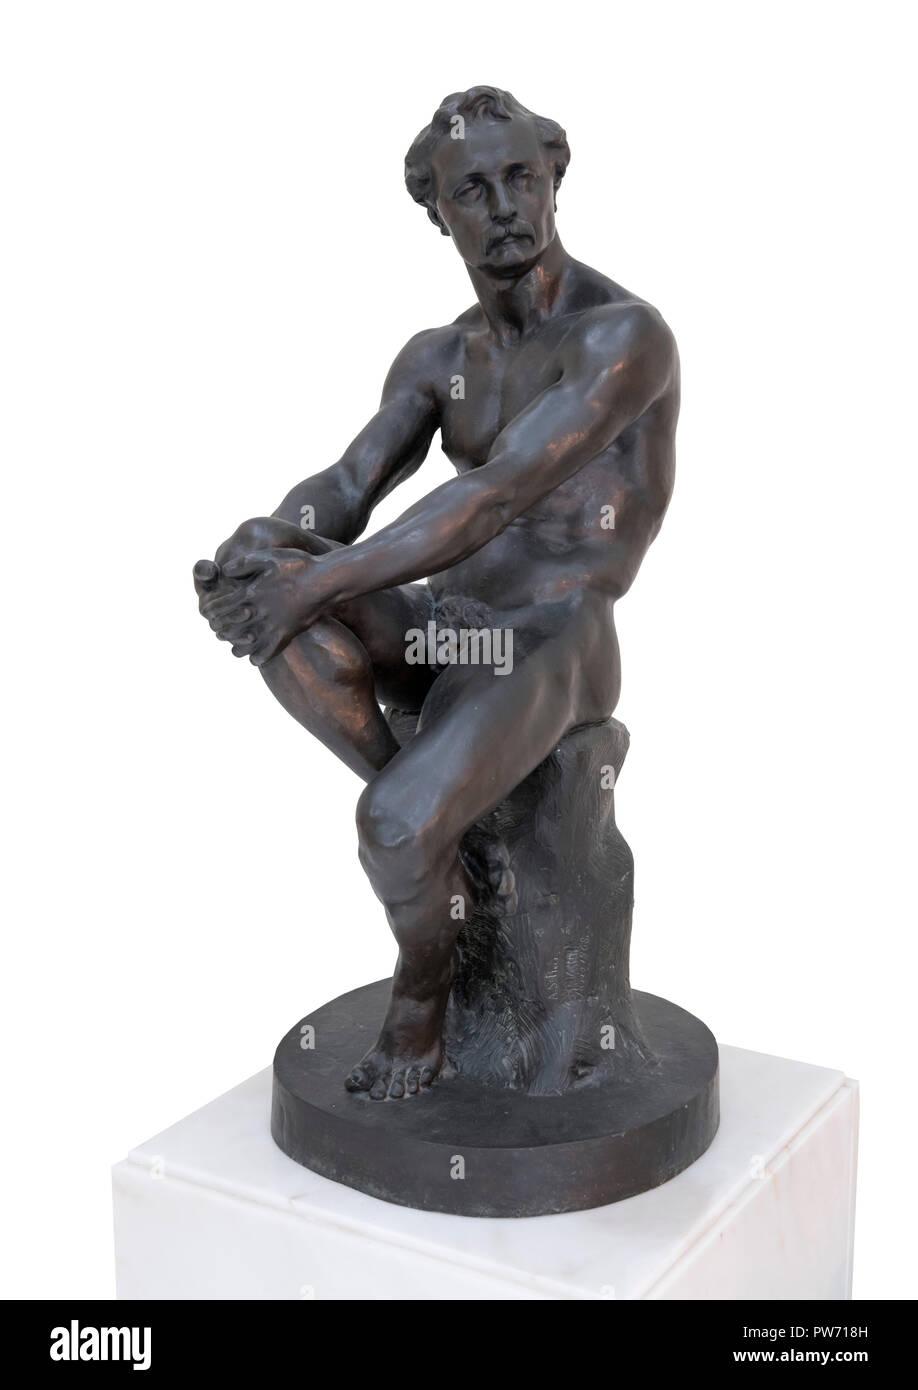 Study of a Sitting Man (Academia - Homem Sentado) by the Portuguese sculptor António Soares dos Reis (1857-1889), bronze, 1868 - Stock Image